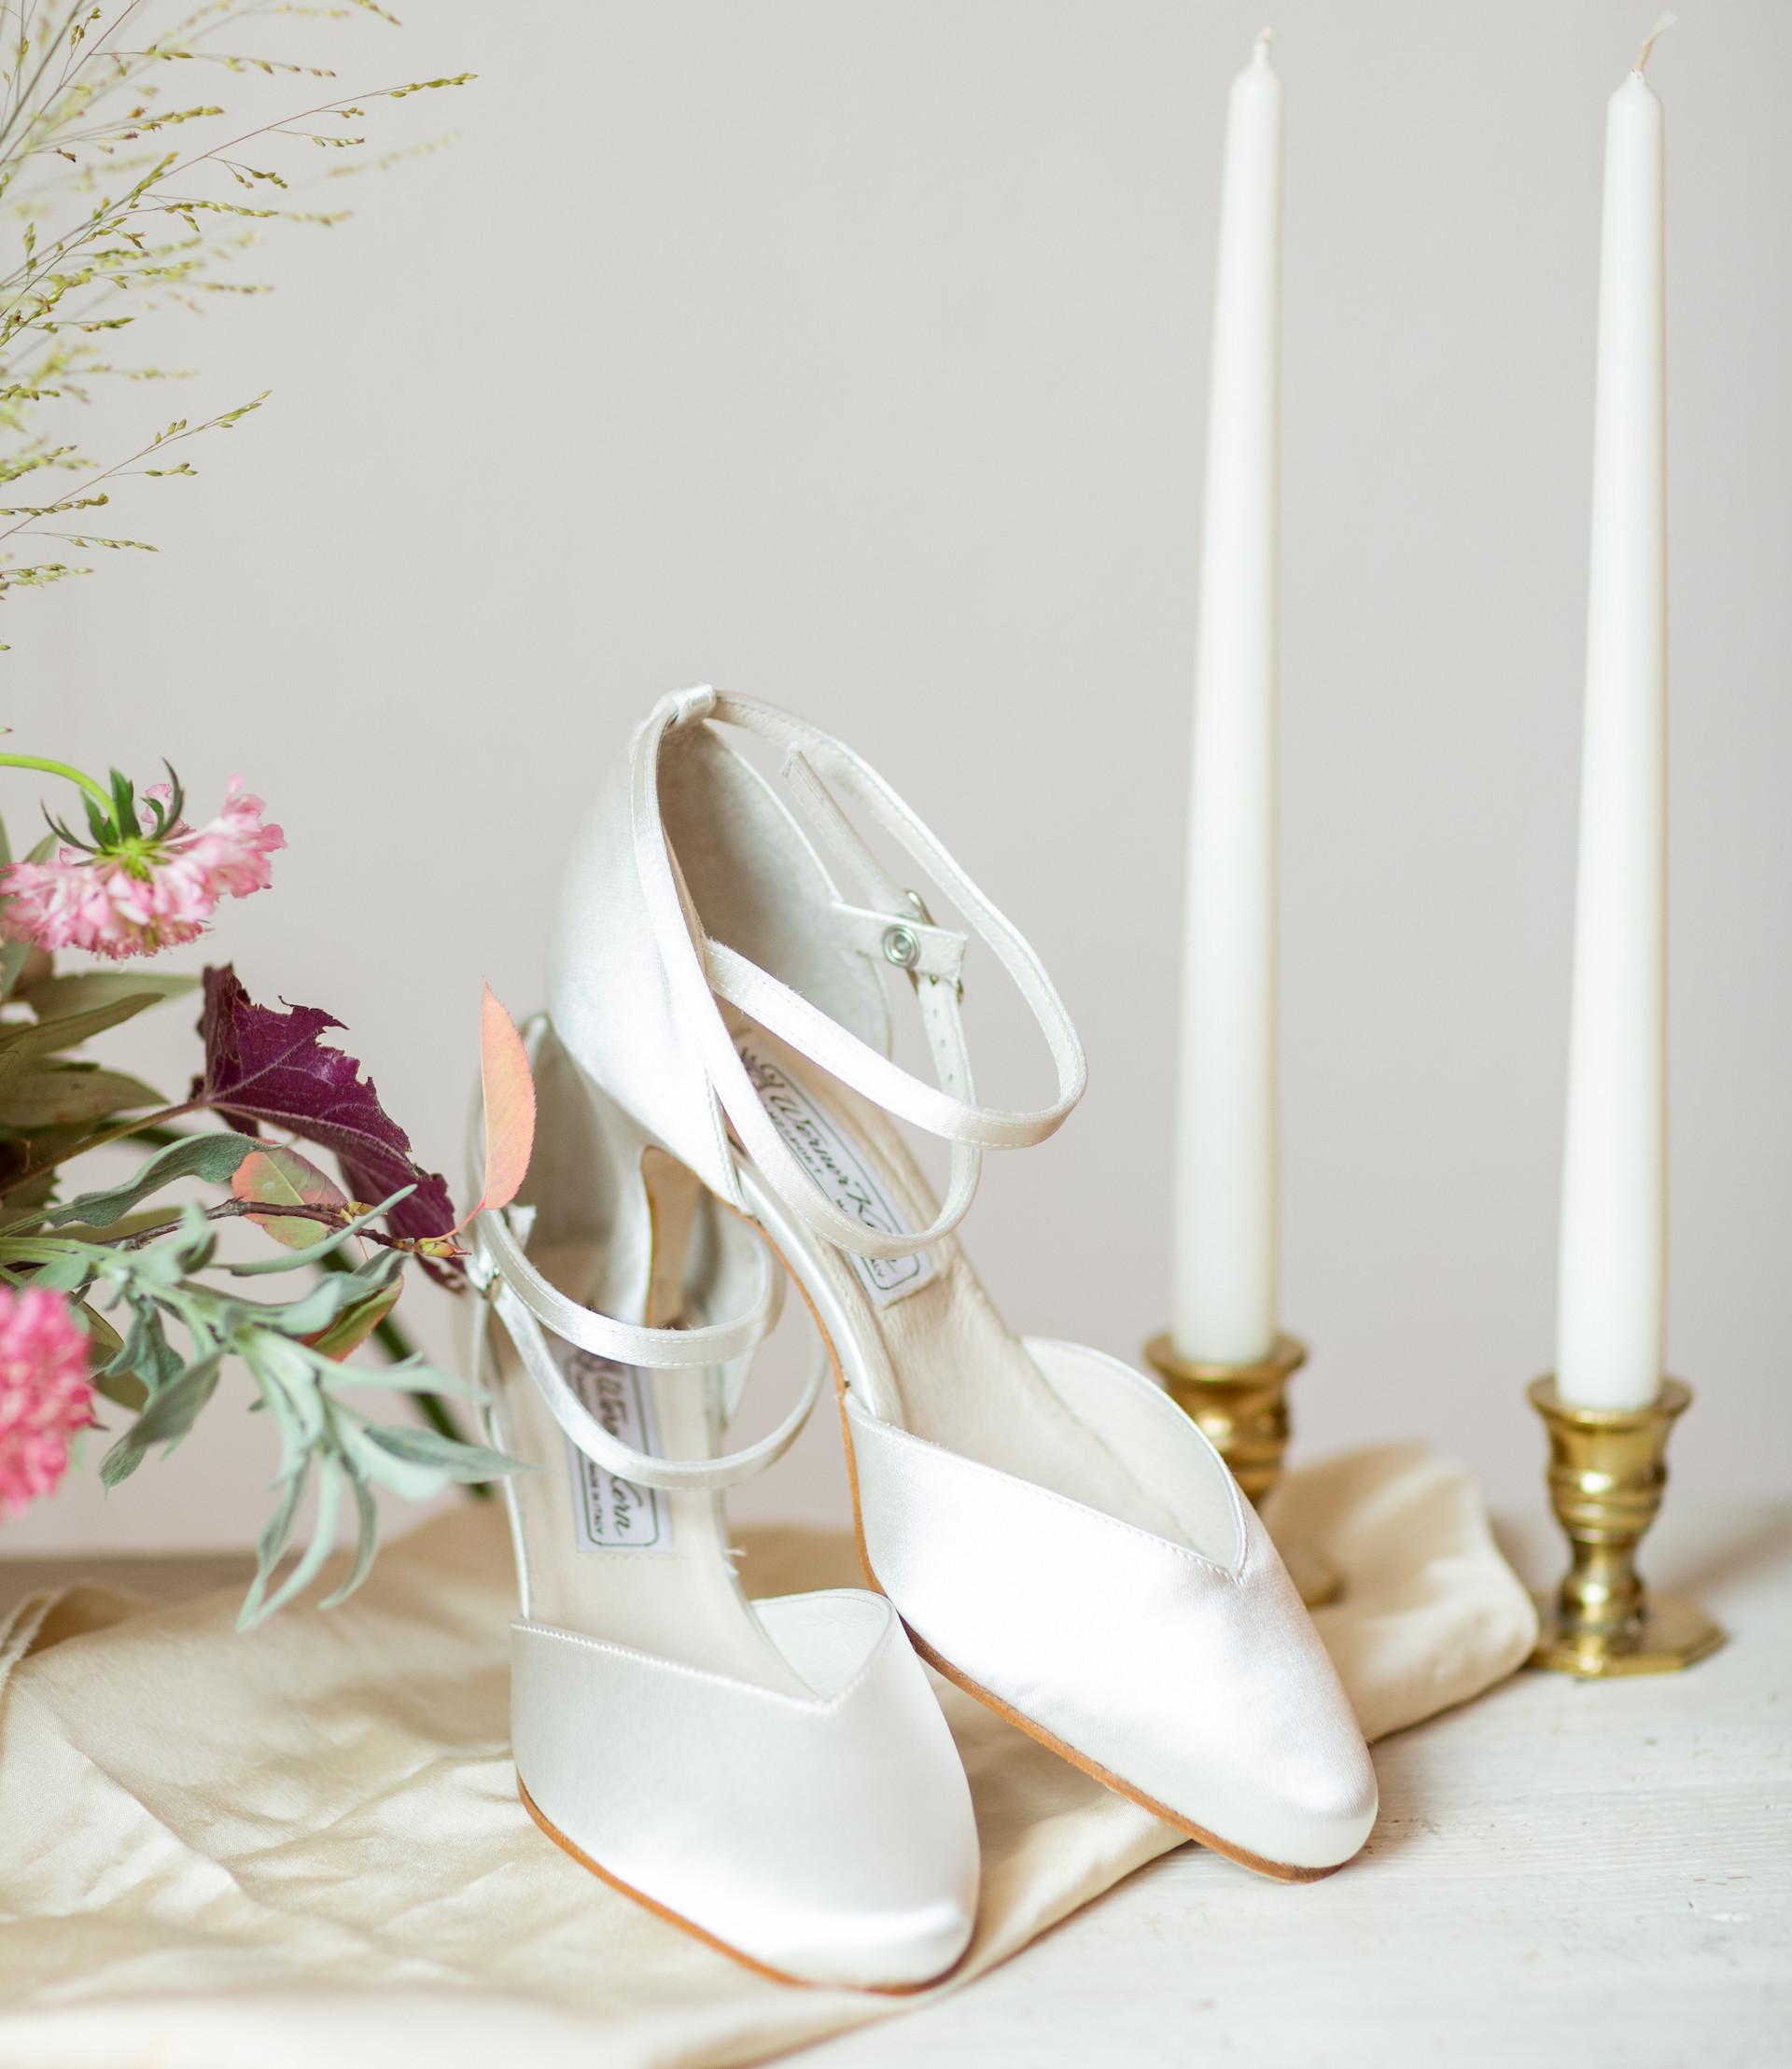 sports shoes b18fa 18faa Stylisch und bequem: Tanzschuhe als Brautschuhe - Heiraten ...